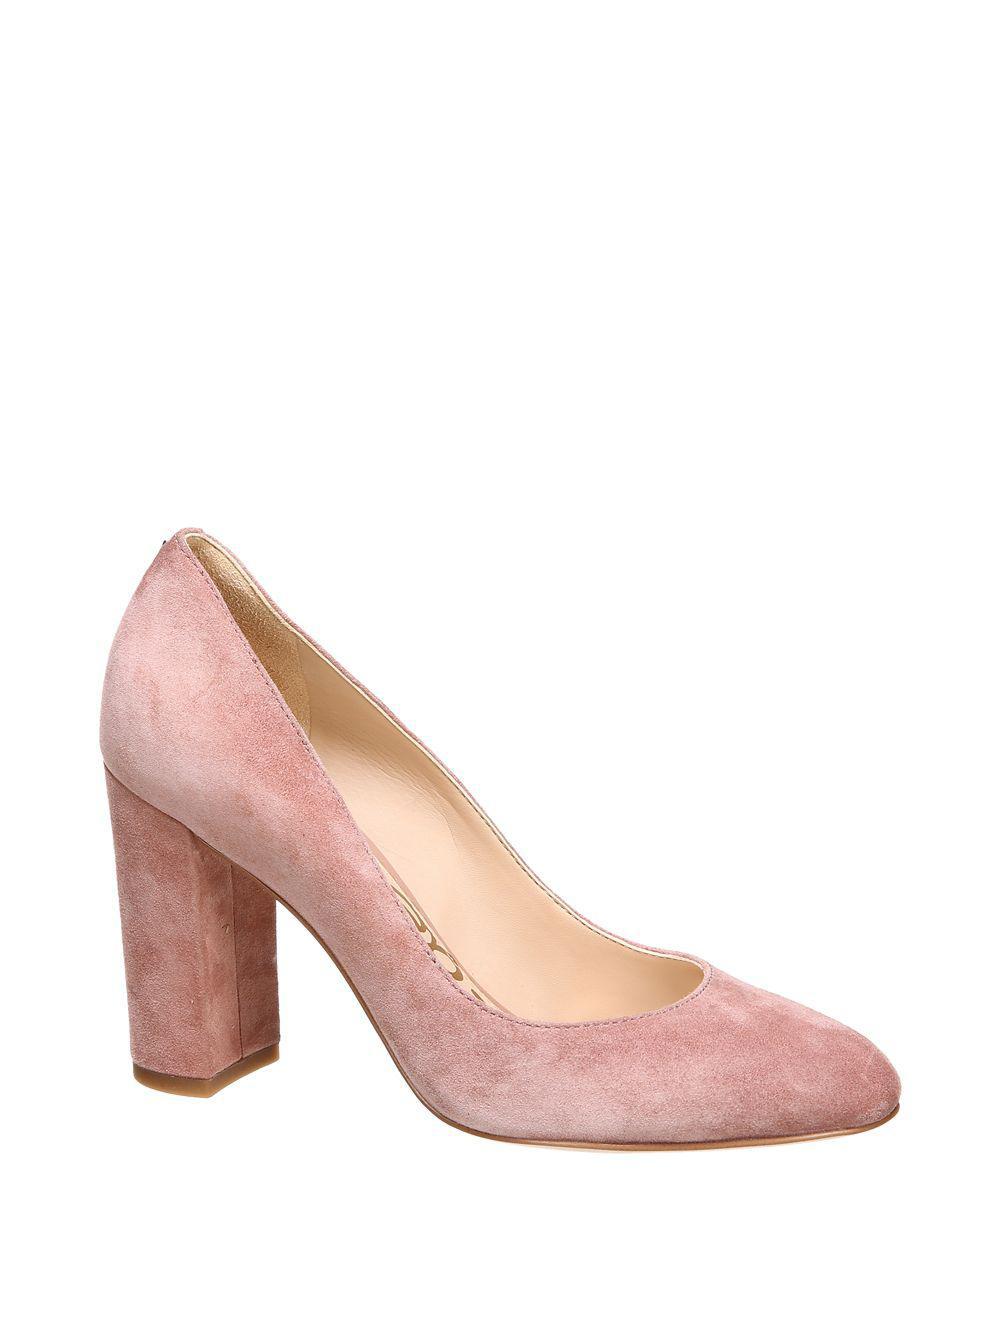 960a50f5f513f4 Lyst - Sam Edelman Stillson Suede Pumps in Pink